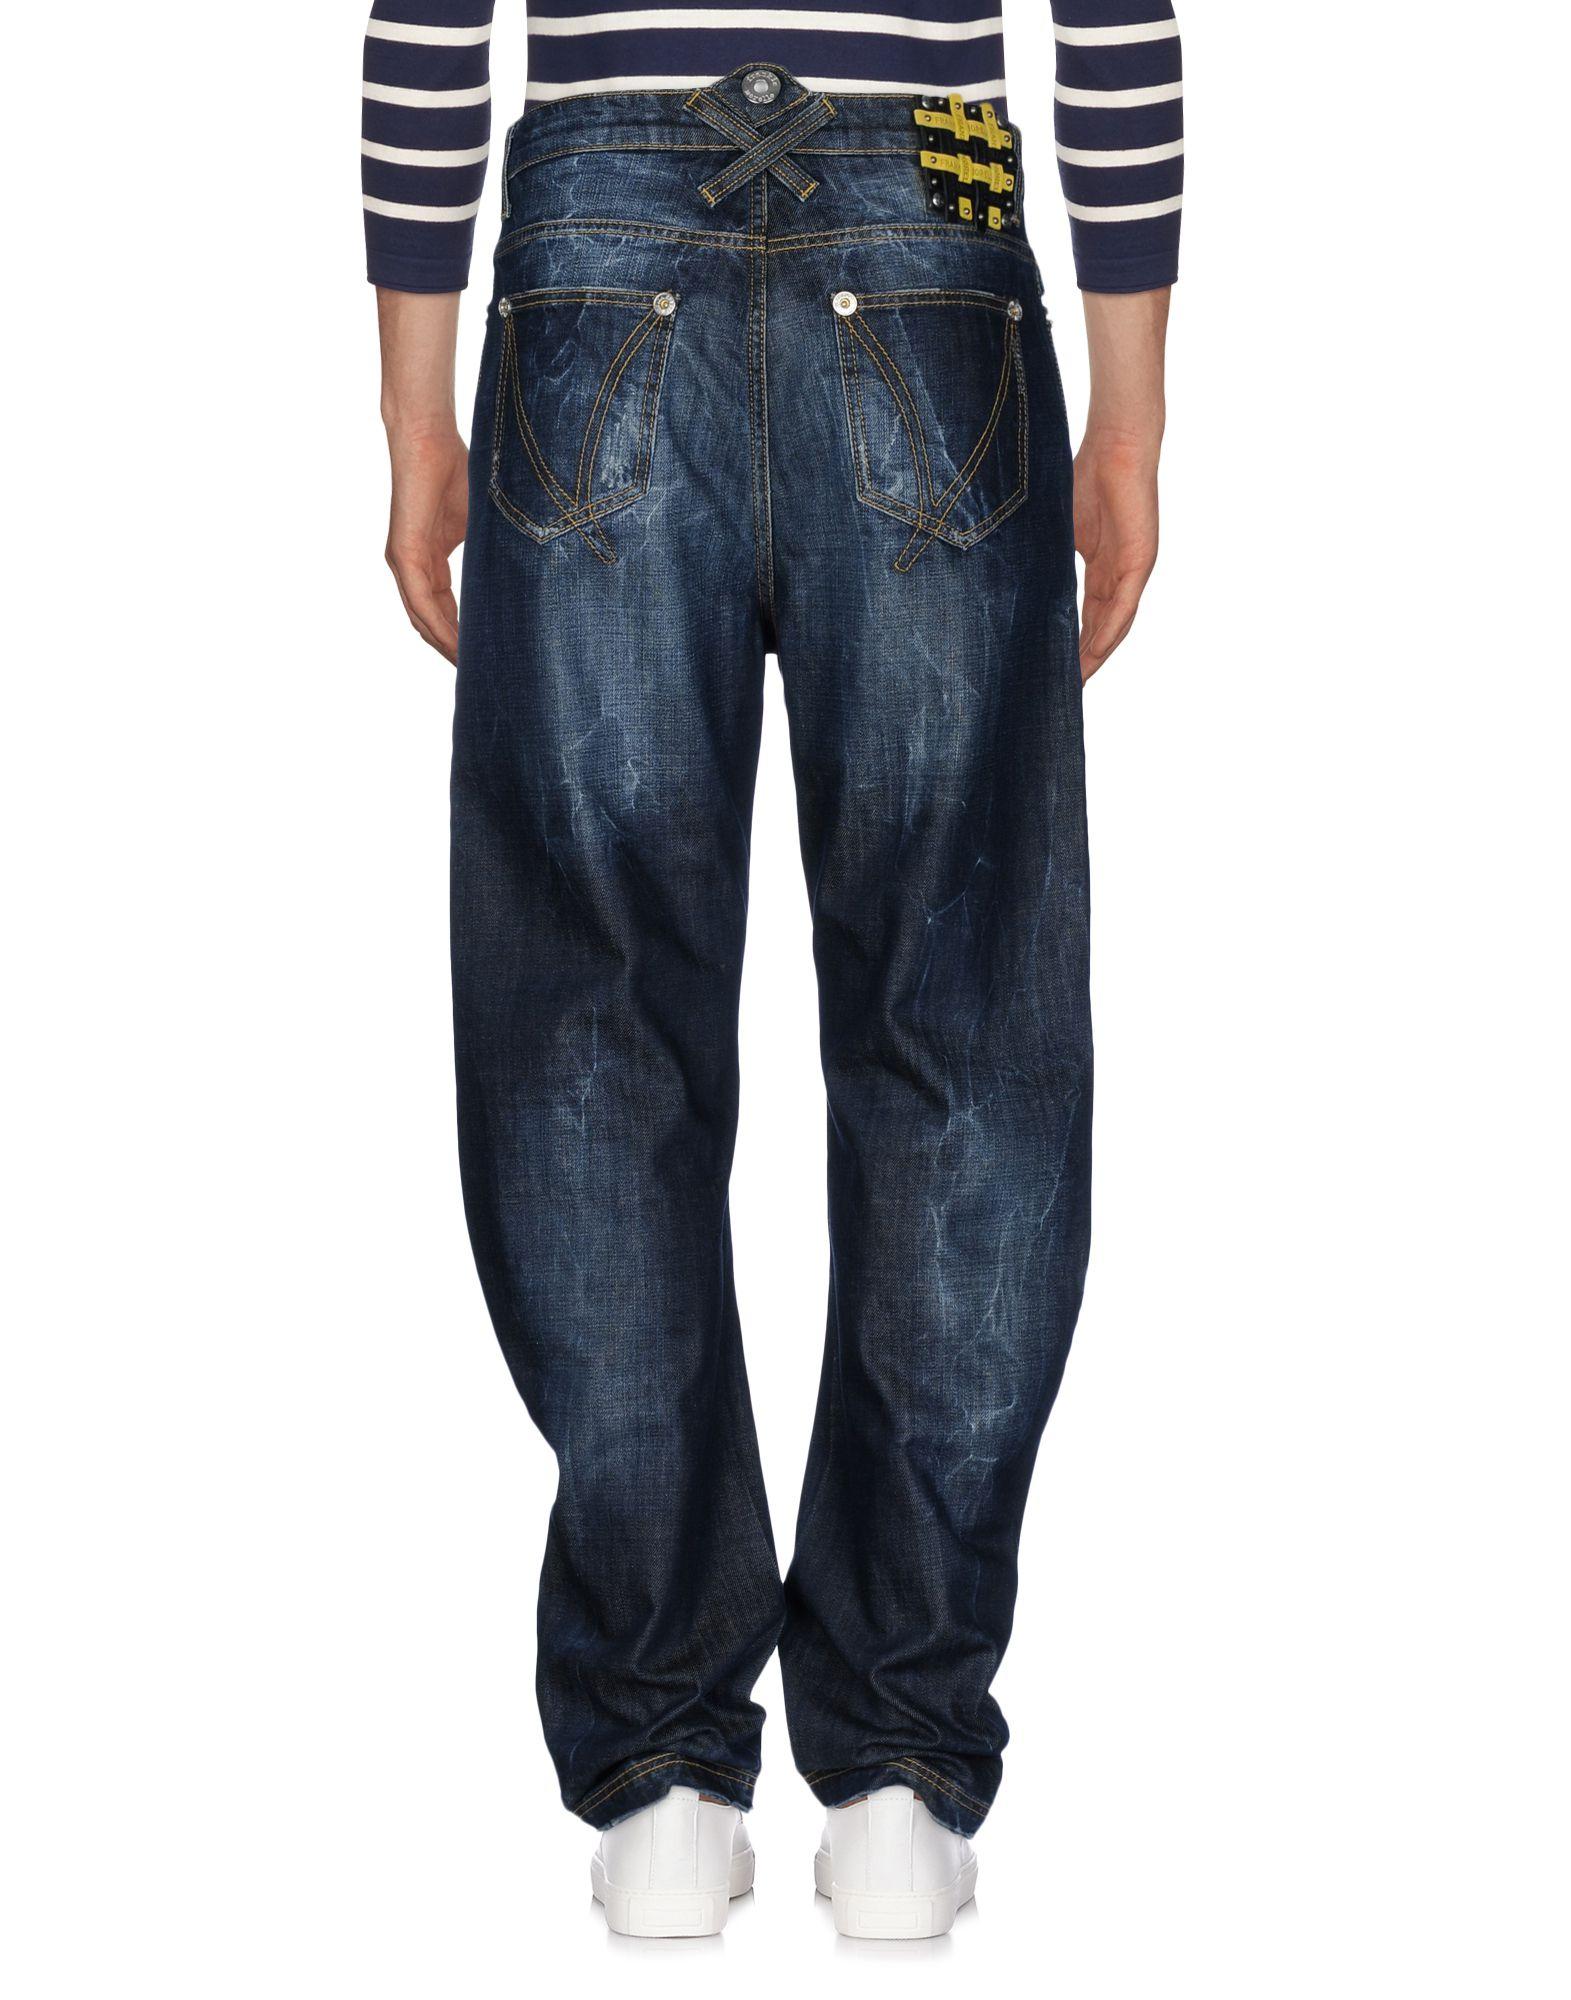 Pantaloni - Jeans Frankie Morello Uomo - Pantaloni 42638097DM e65068